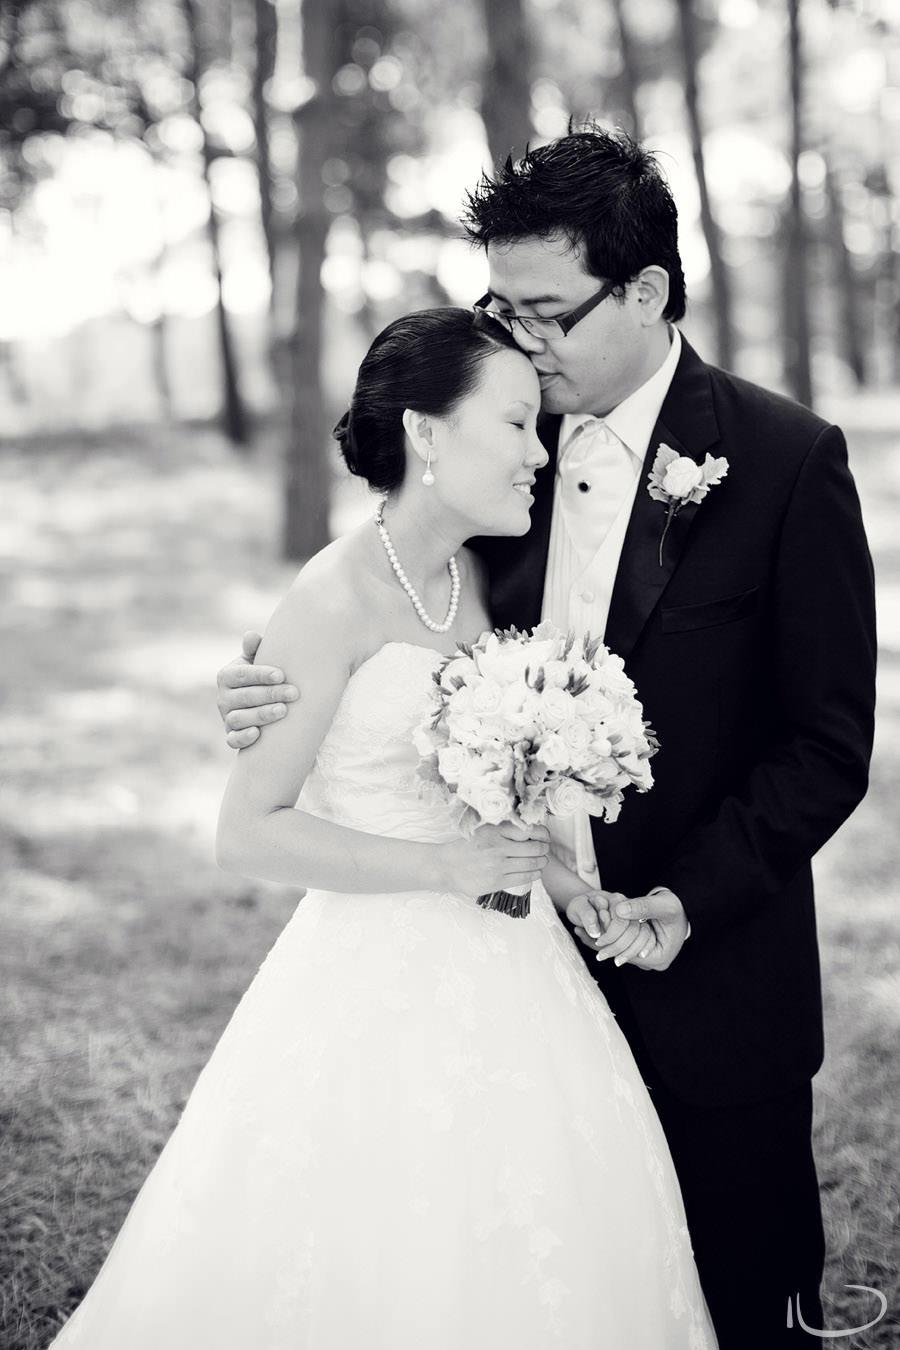 Sydney Centennial Park Wedding Photographer: Bride & Groom